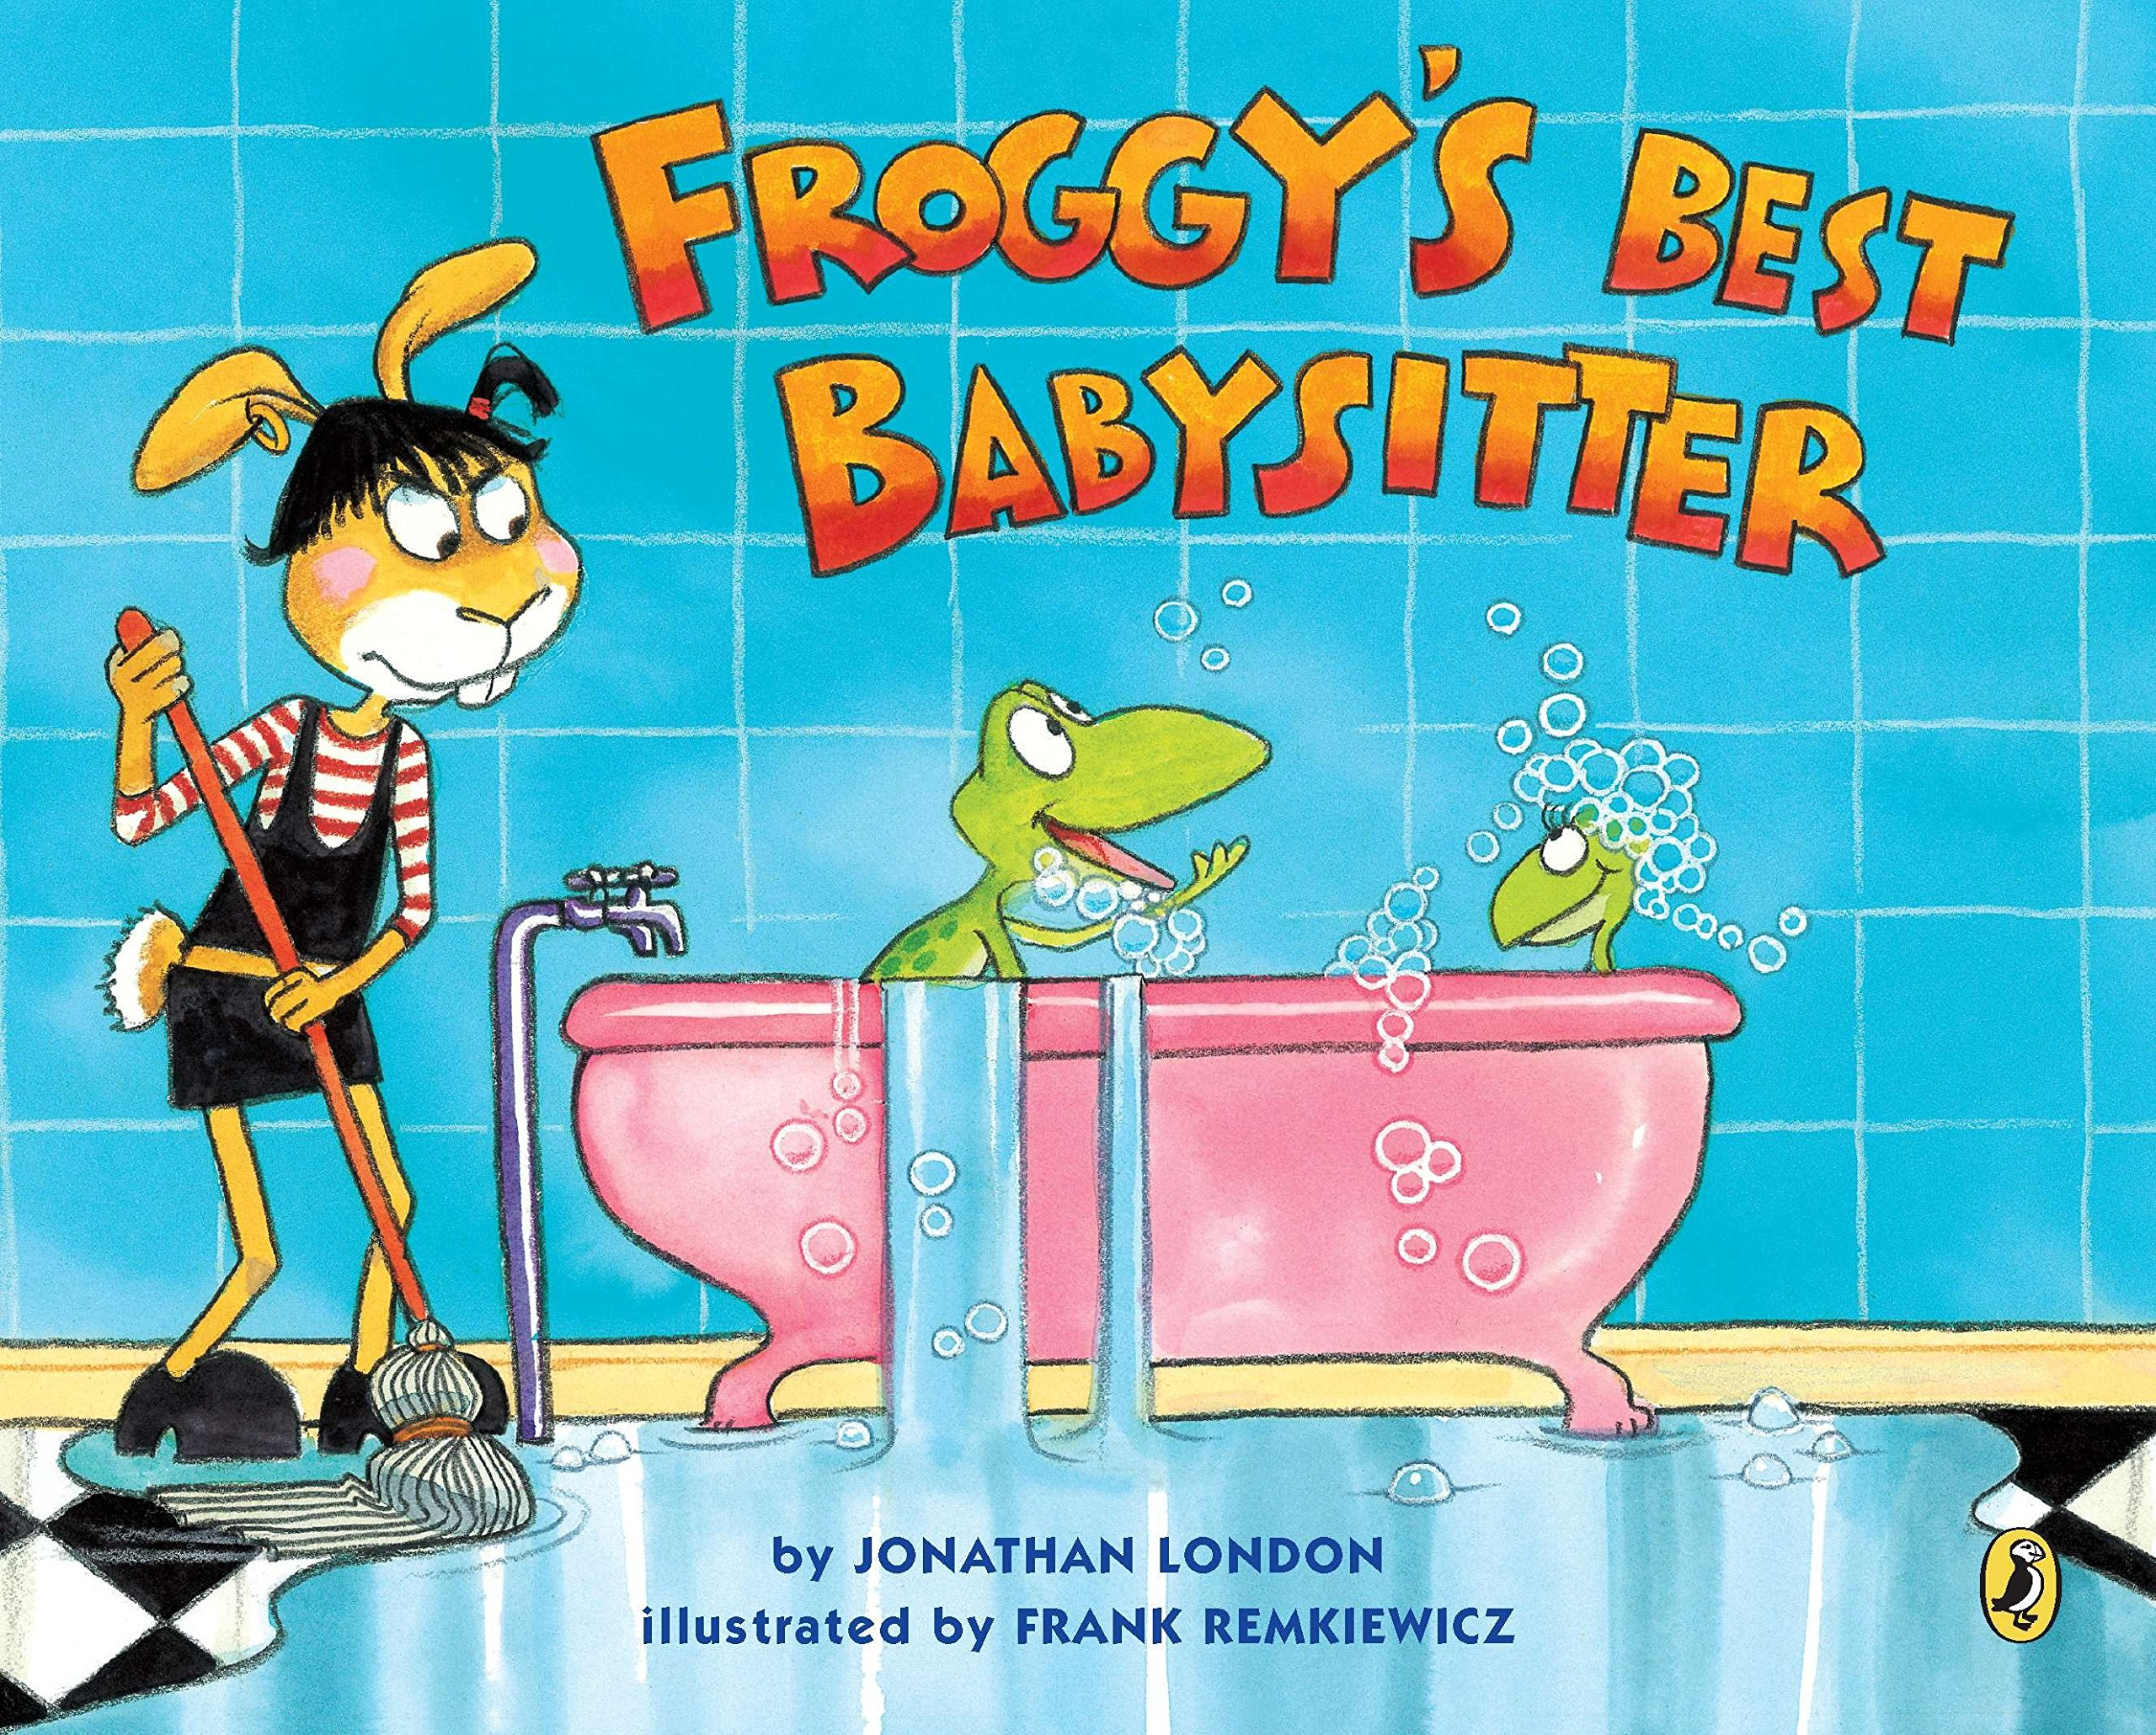 amazon froggy s best babysitter jonathan london frank